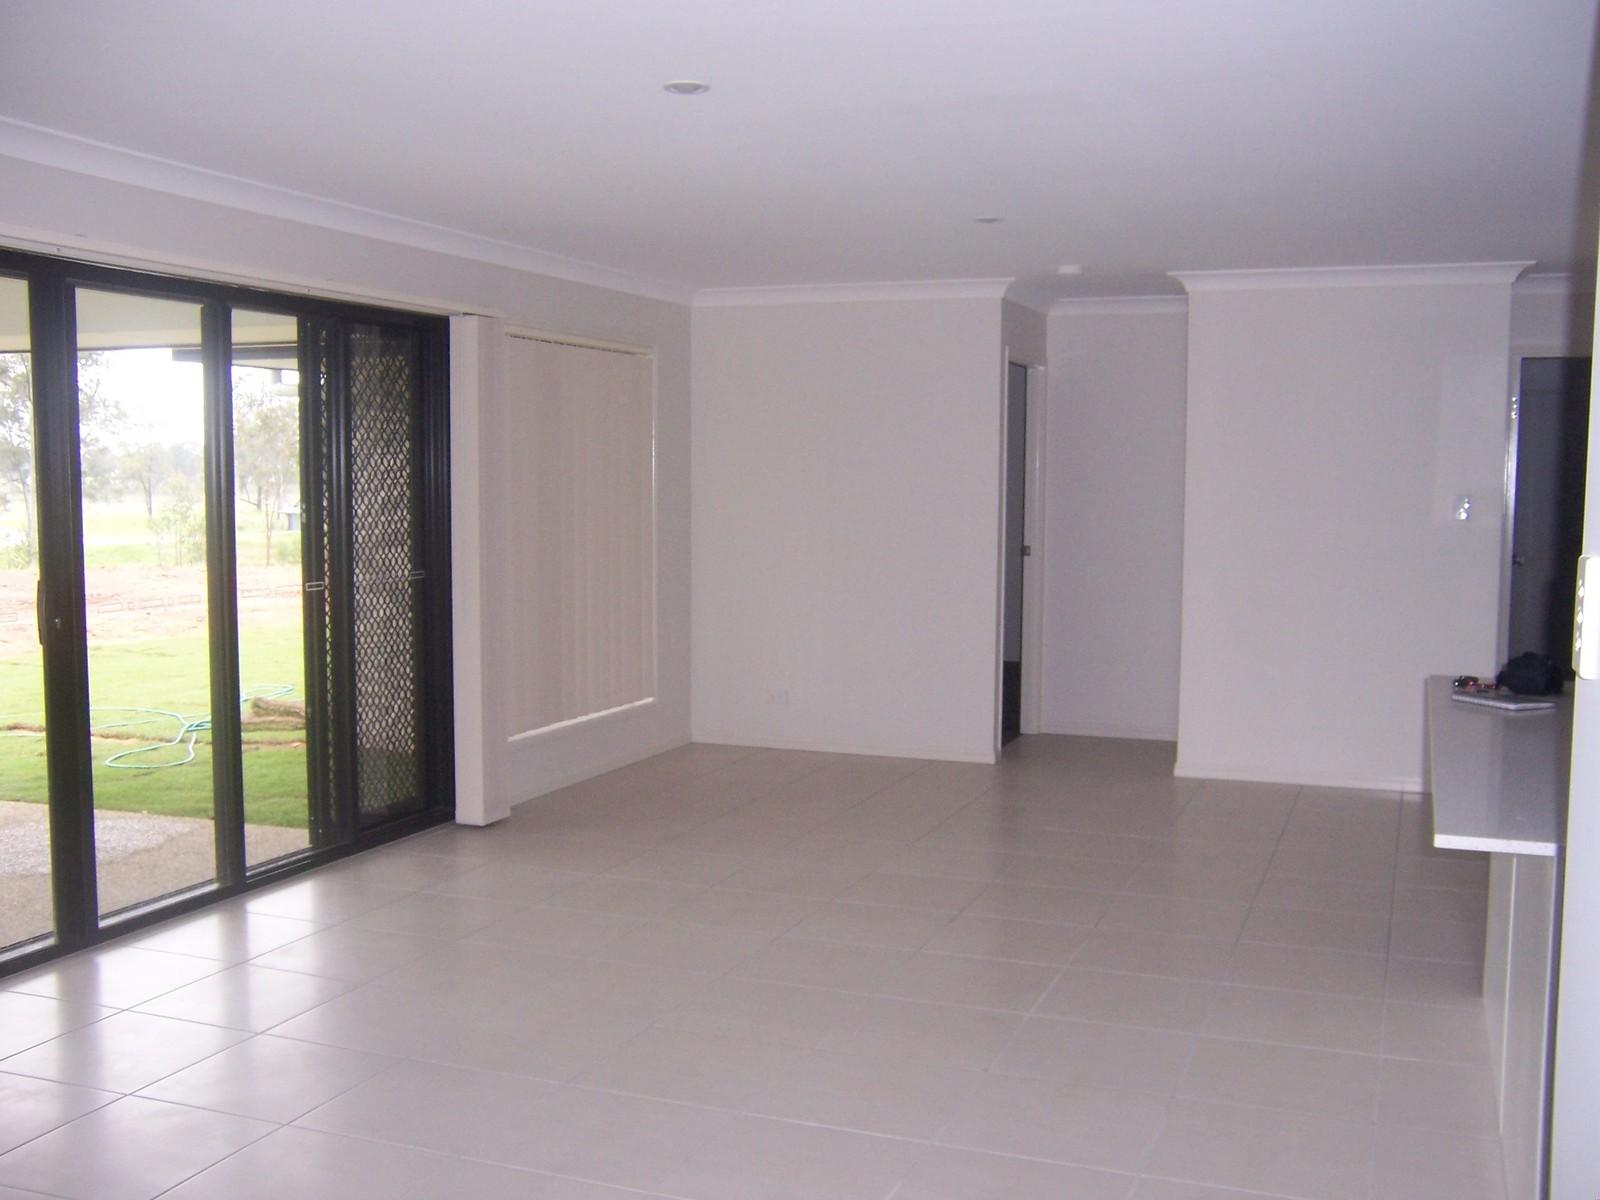 Room 4/8 Boysen Court, Adare